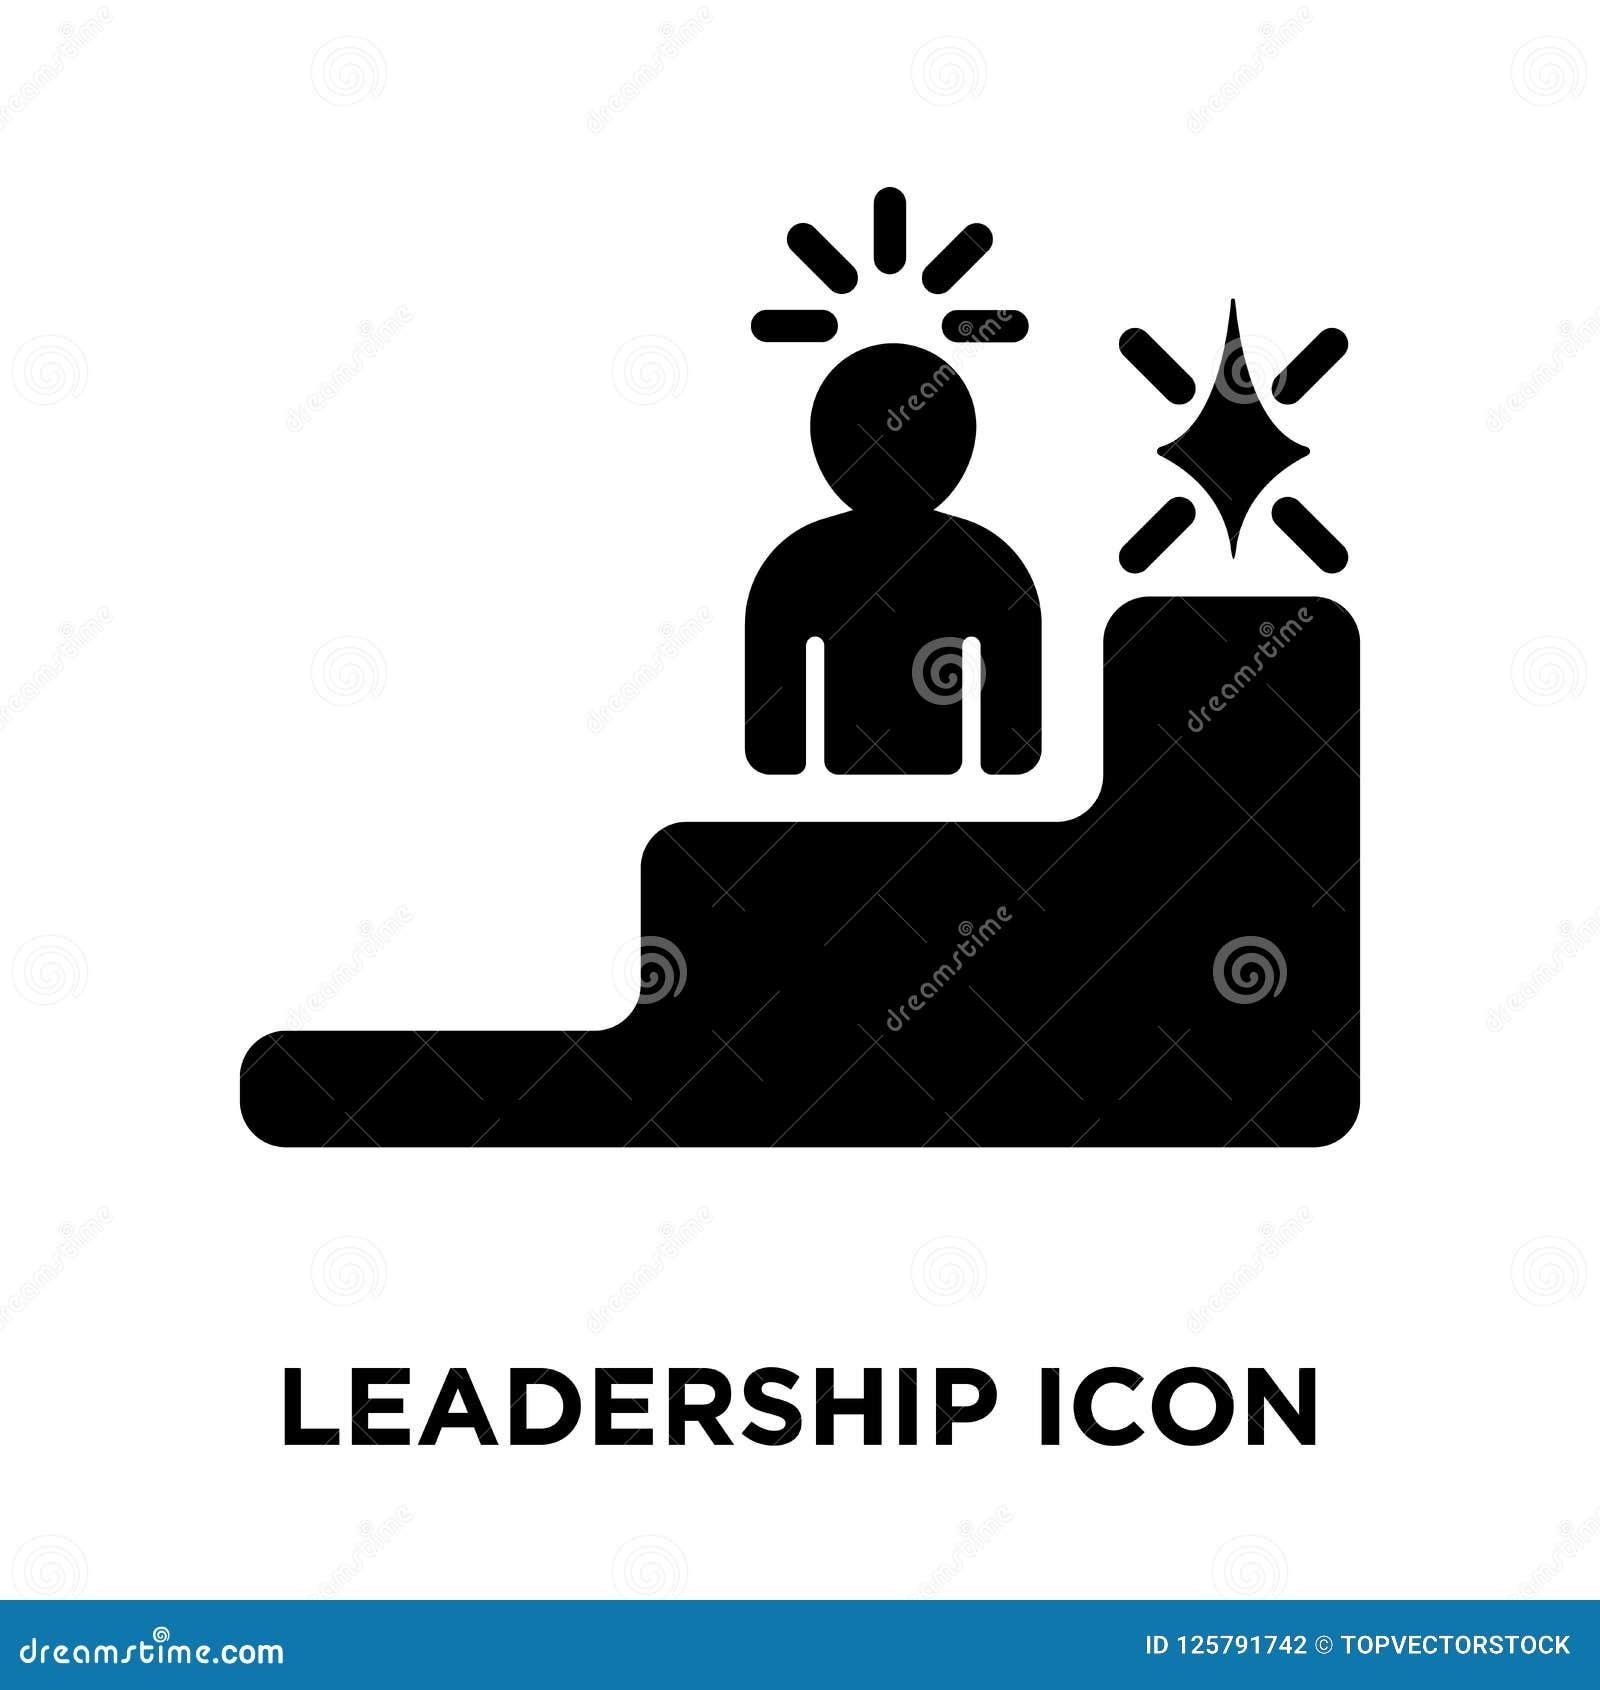 Black Leadership White Stock Illustrations 23 588 Black Leadership White Stock Illustrations Vectors Clipart Dreamstime